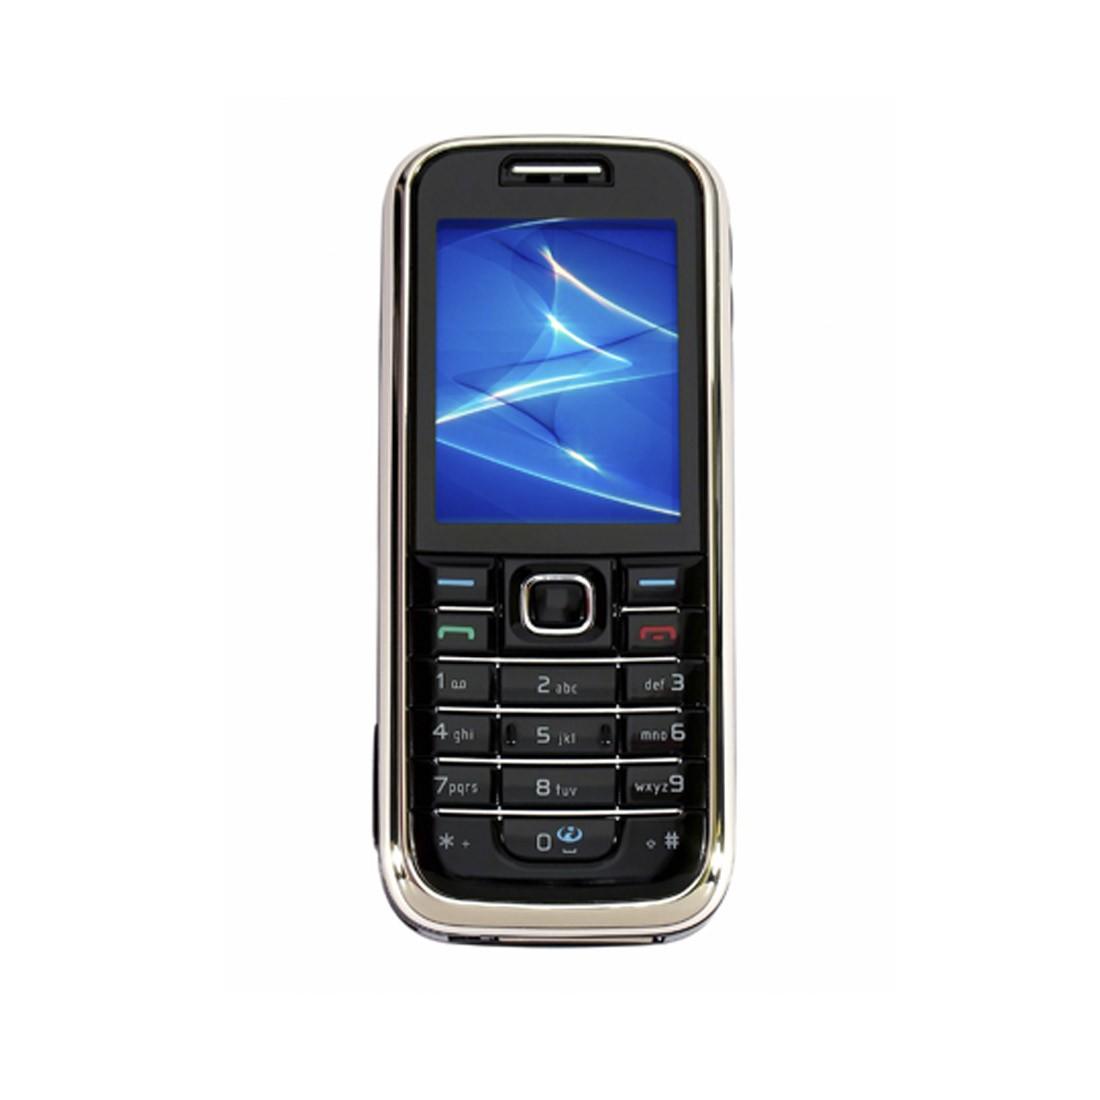 Nokia 2610 Phone